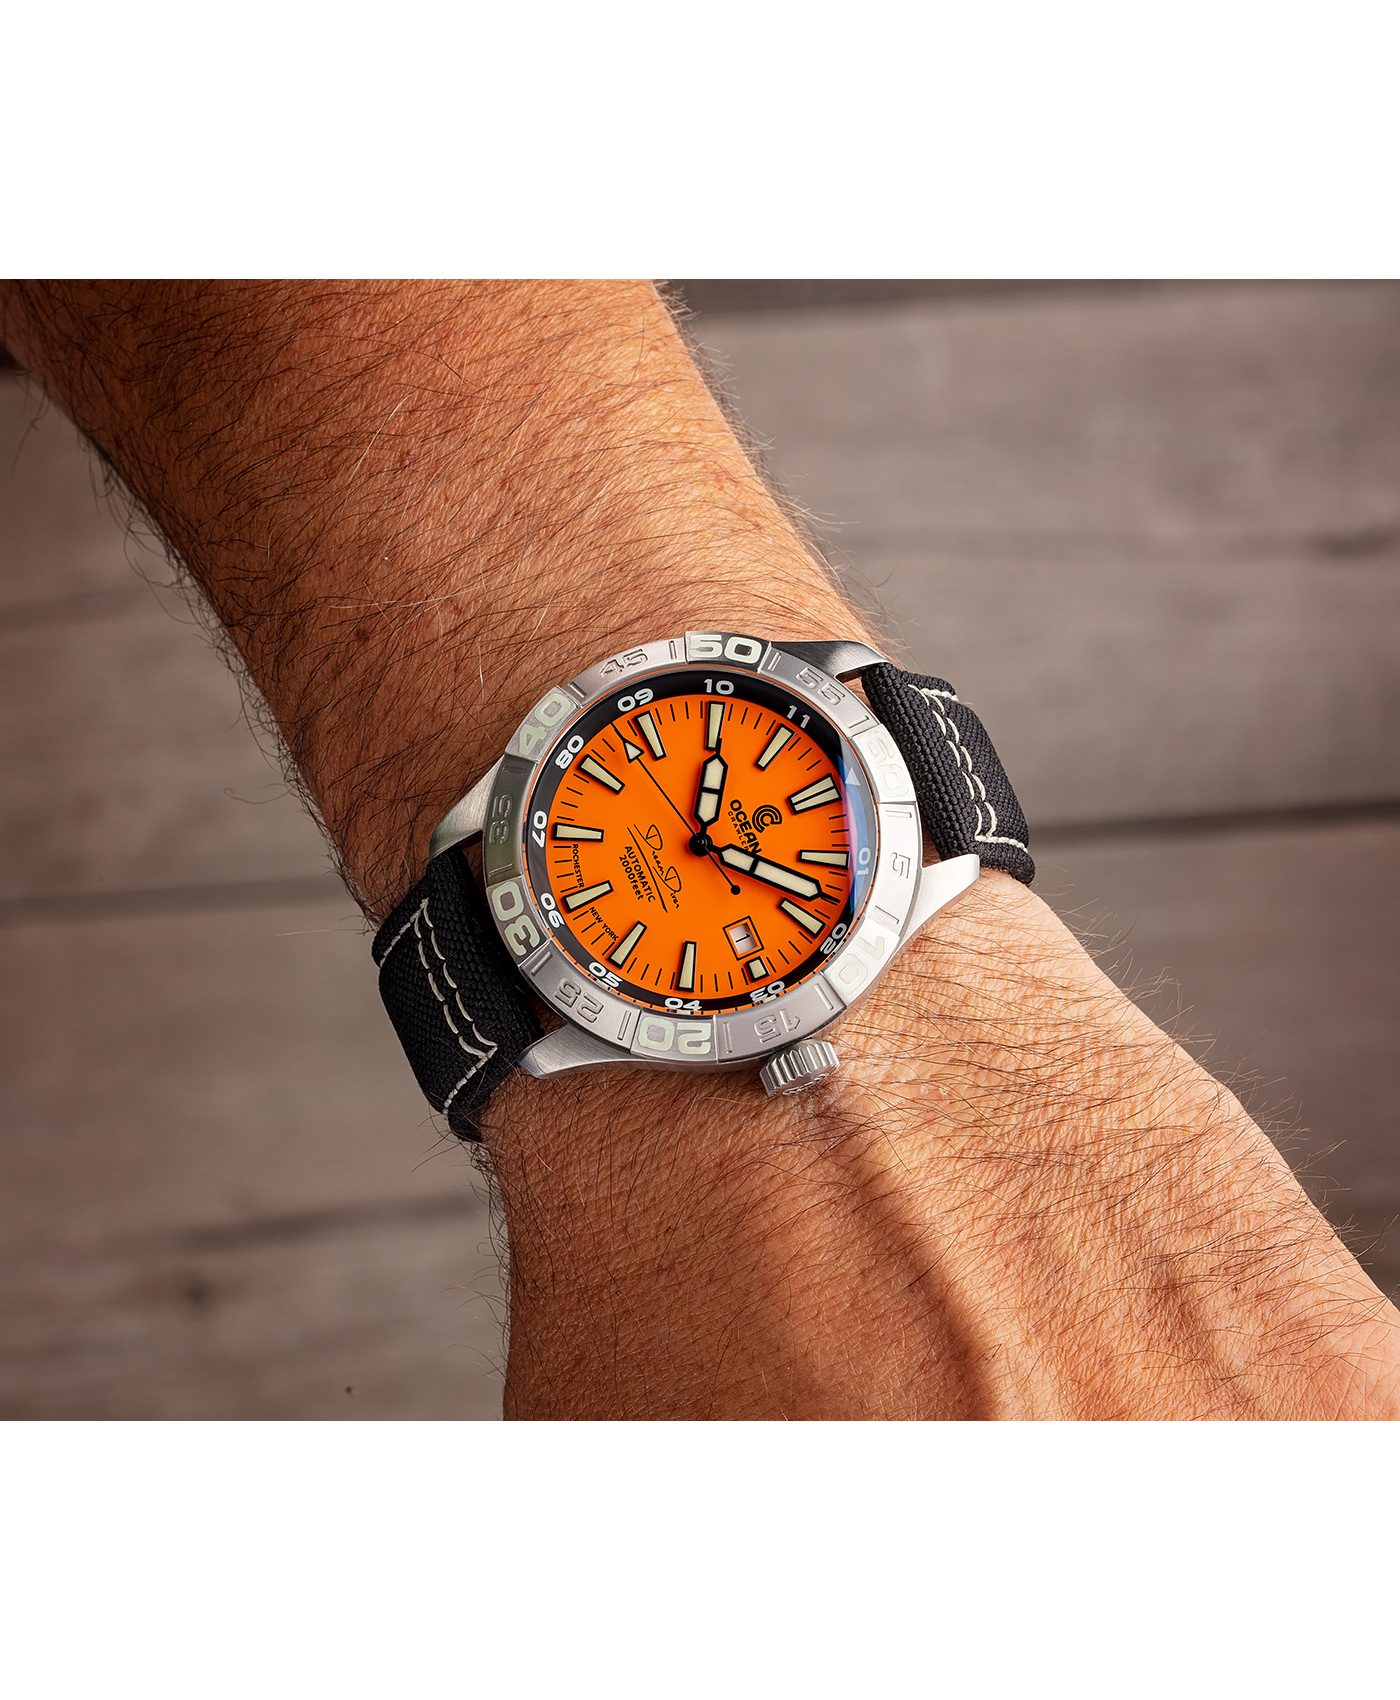 WB Ocean Crawler Dream Diver Dream Diver Orange Dial wrist